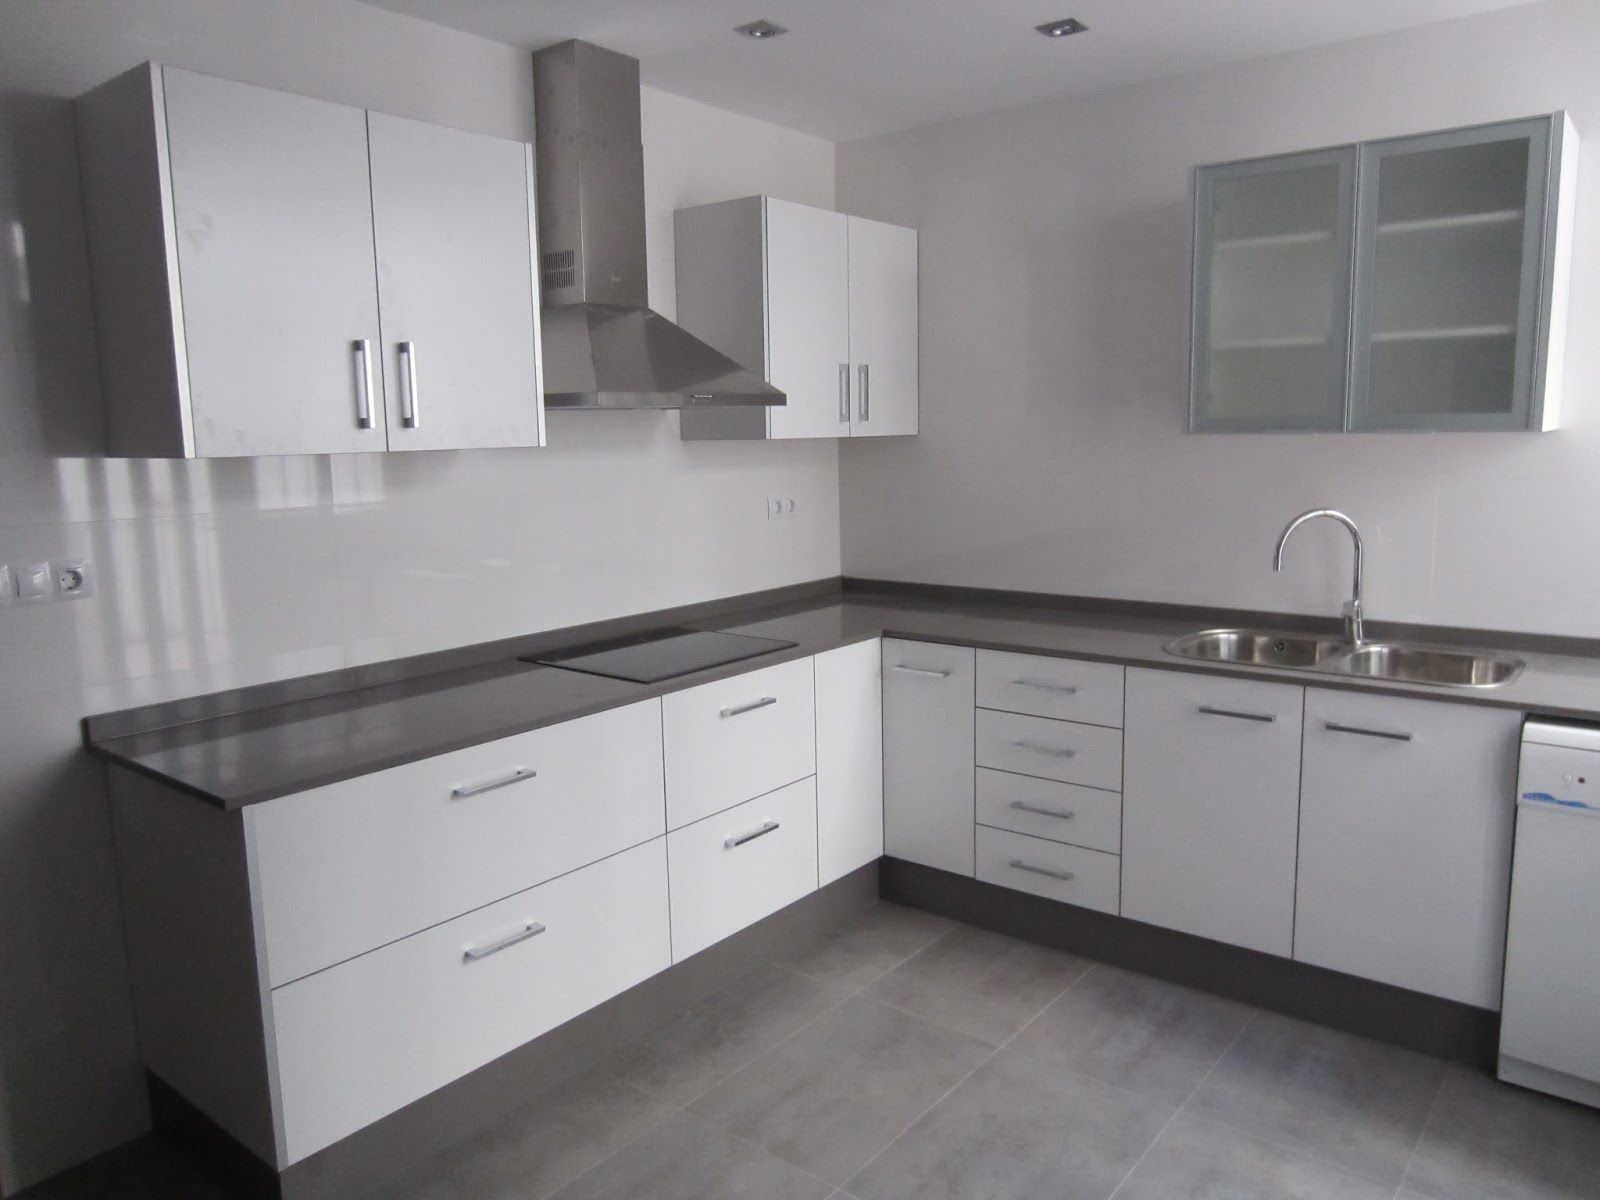 mueble+cocina+blanco+brillo.JPG (1600×1200) | Cocina | Pinterest ...